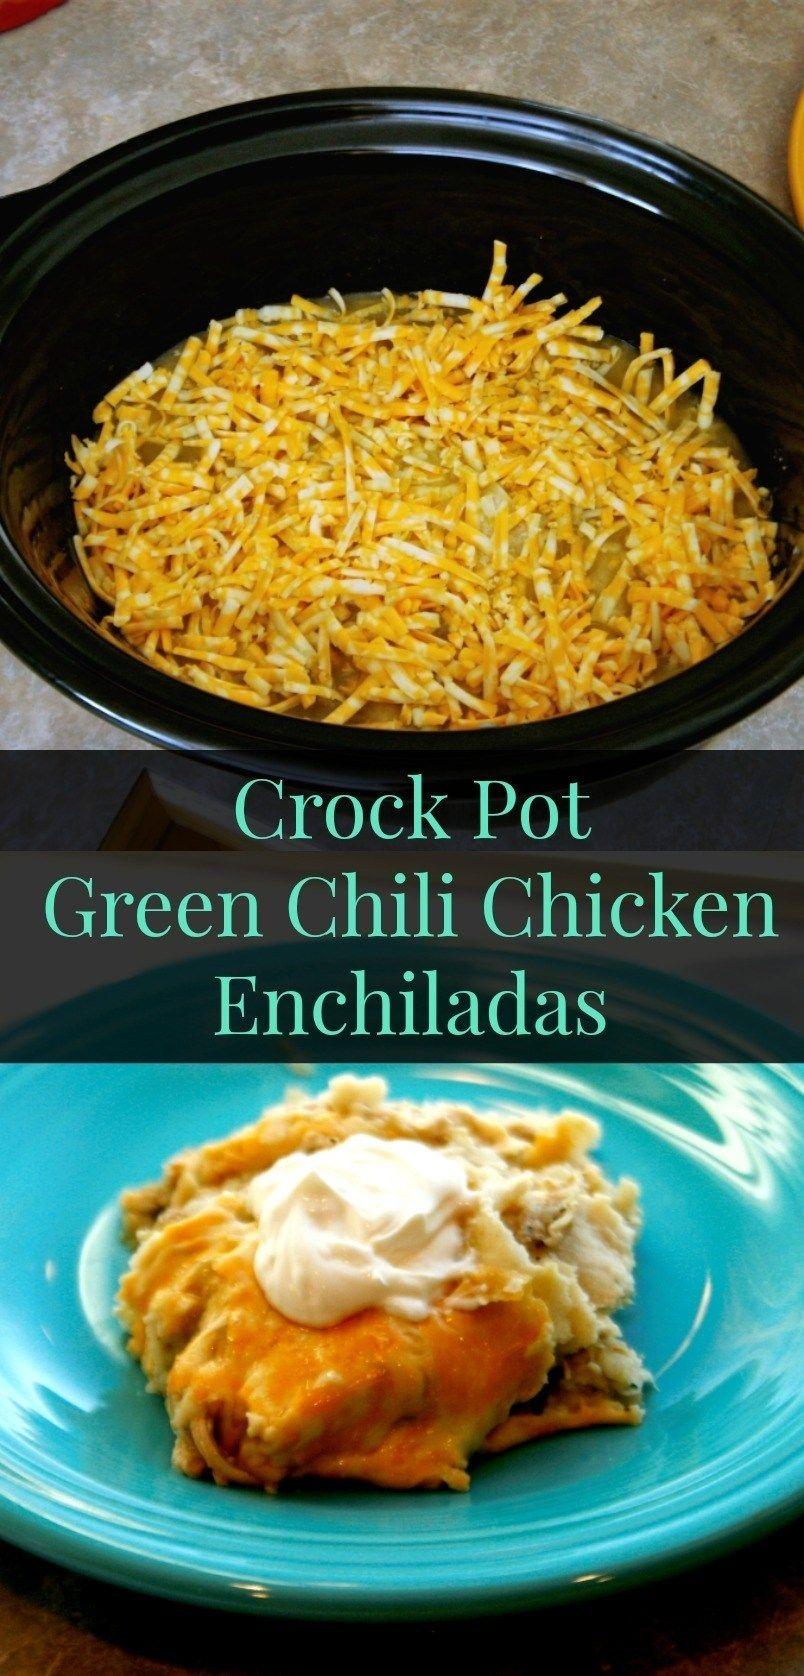 Crock Pot Green Chili Chicken Enchilada Casserole images